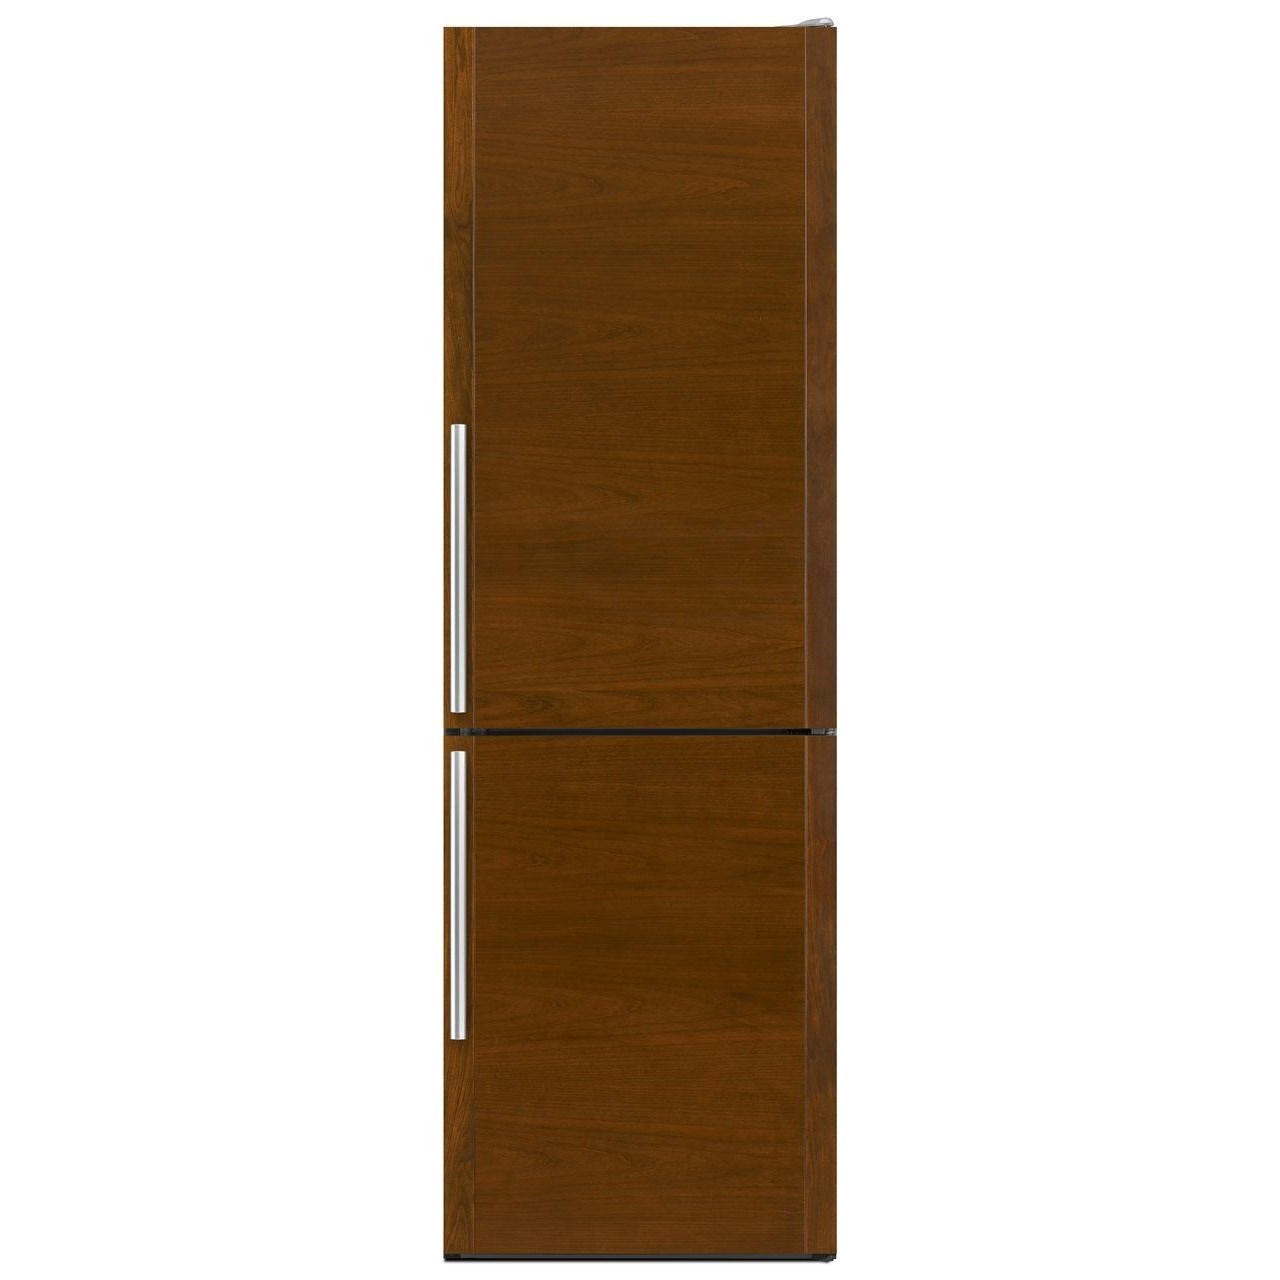 "Refrigerators - Bottom Freezer 10 Cu. Ft. 24""  Panel Ready Refrigerator by Jenn-Air at Furniture and ApplianceMart"